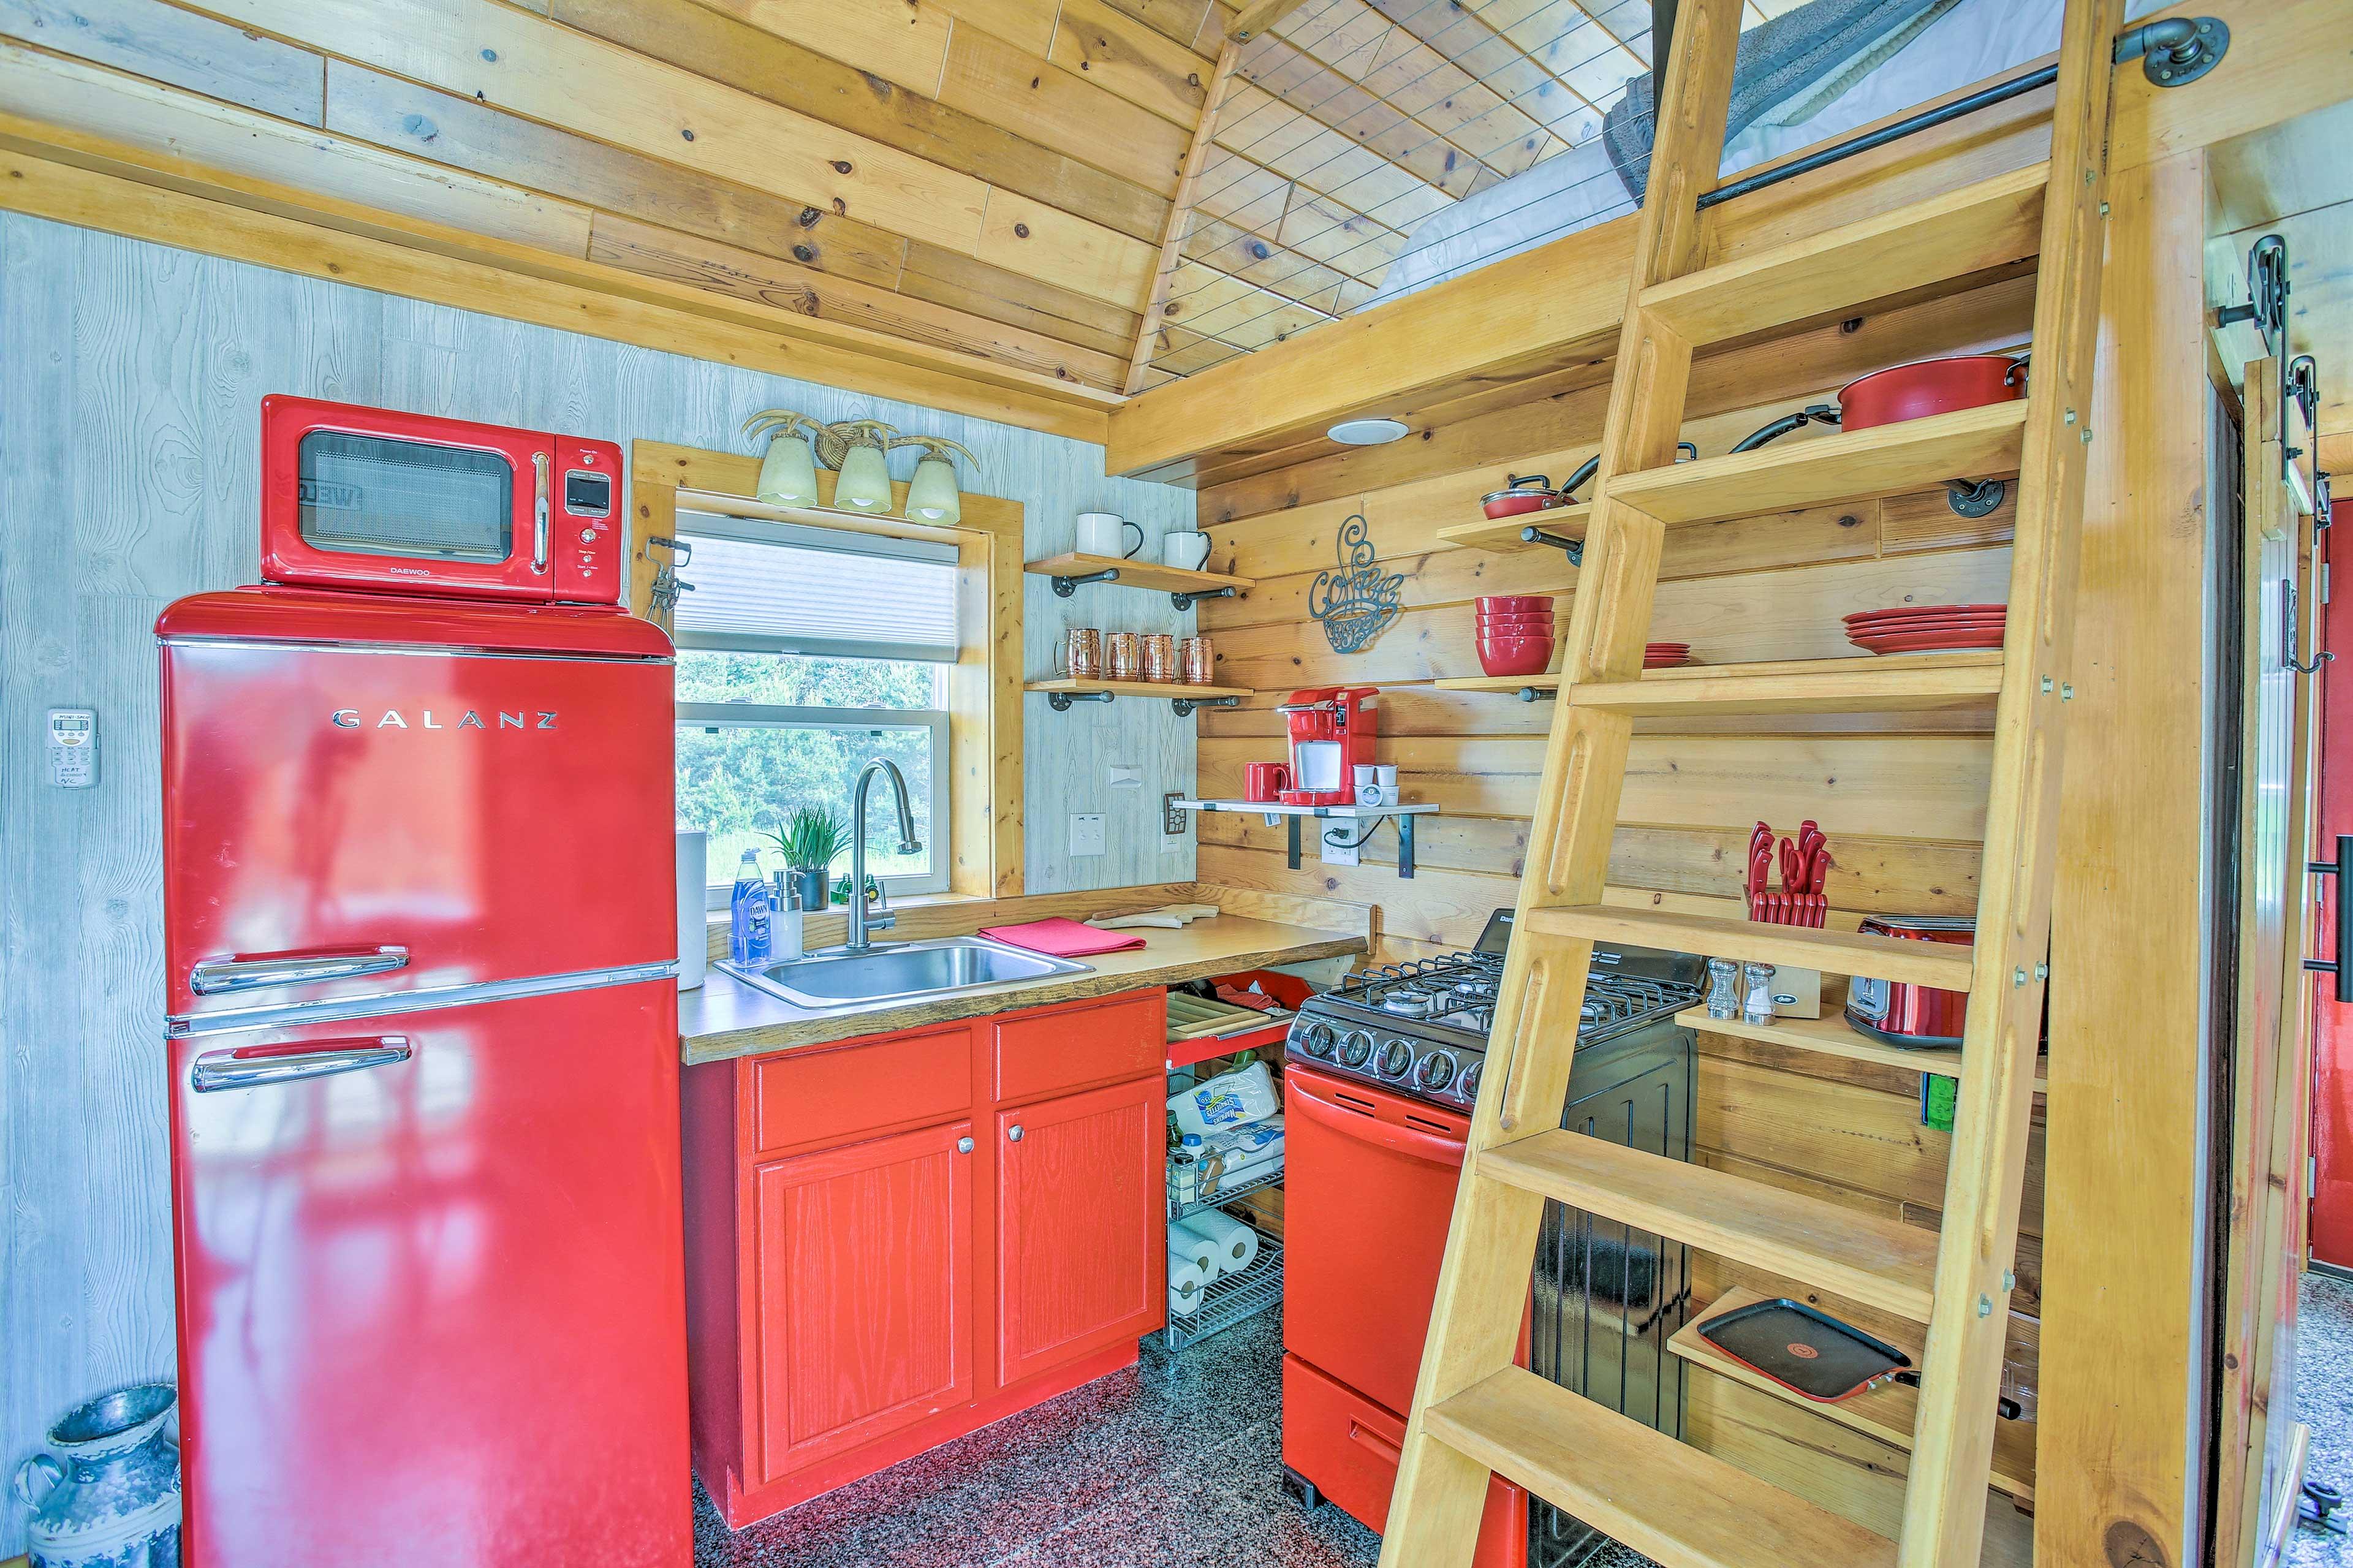 Kitchen | Cooking Basics | Toaster | Keurig | Toaster Oven